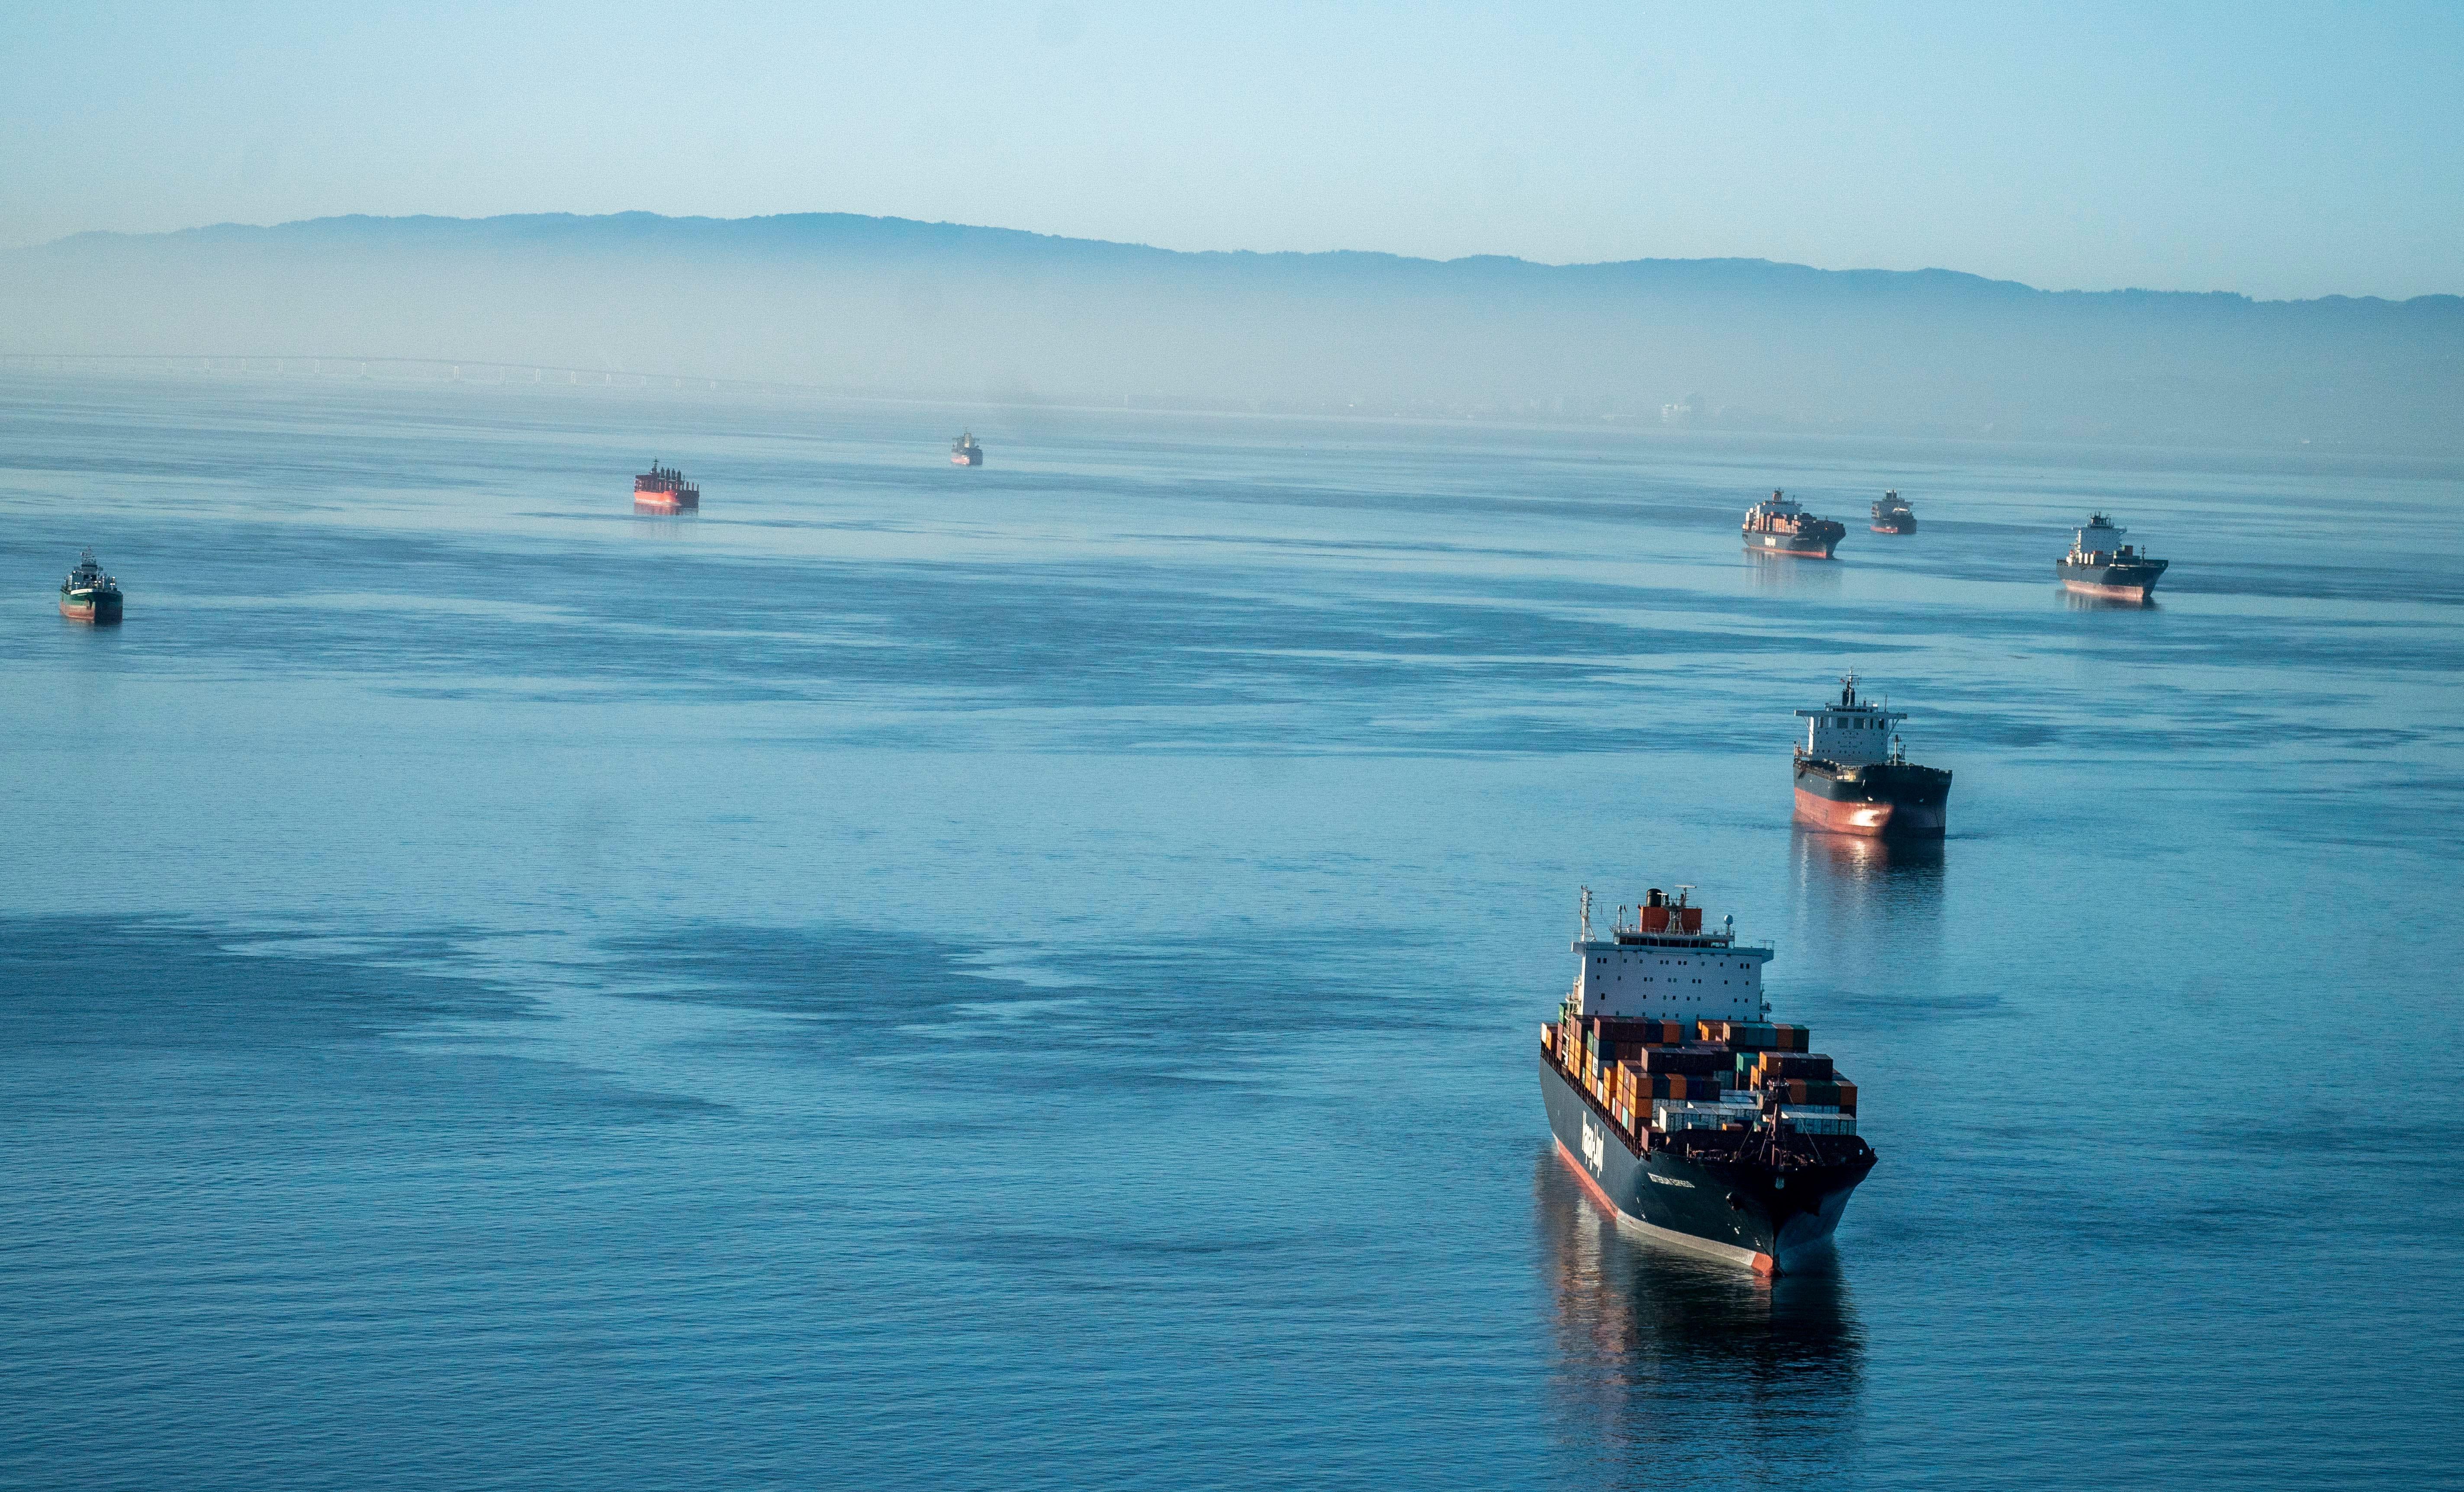 Essential, invisible: COVID has 200,000 merchant sailors stuck at sea 1